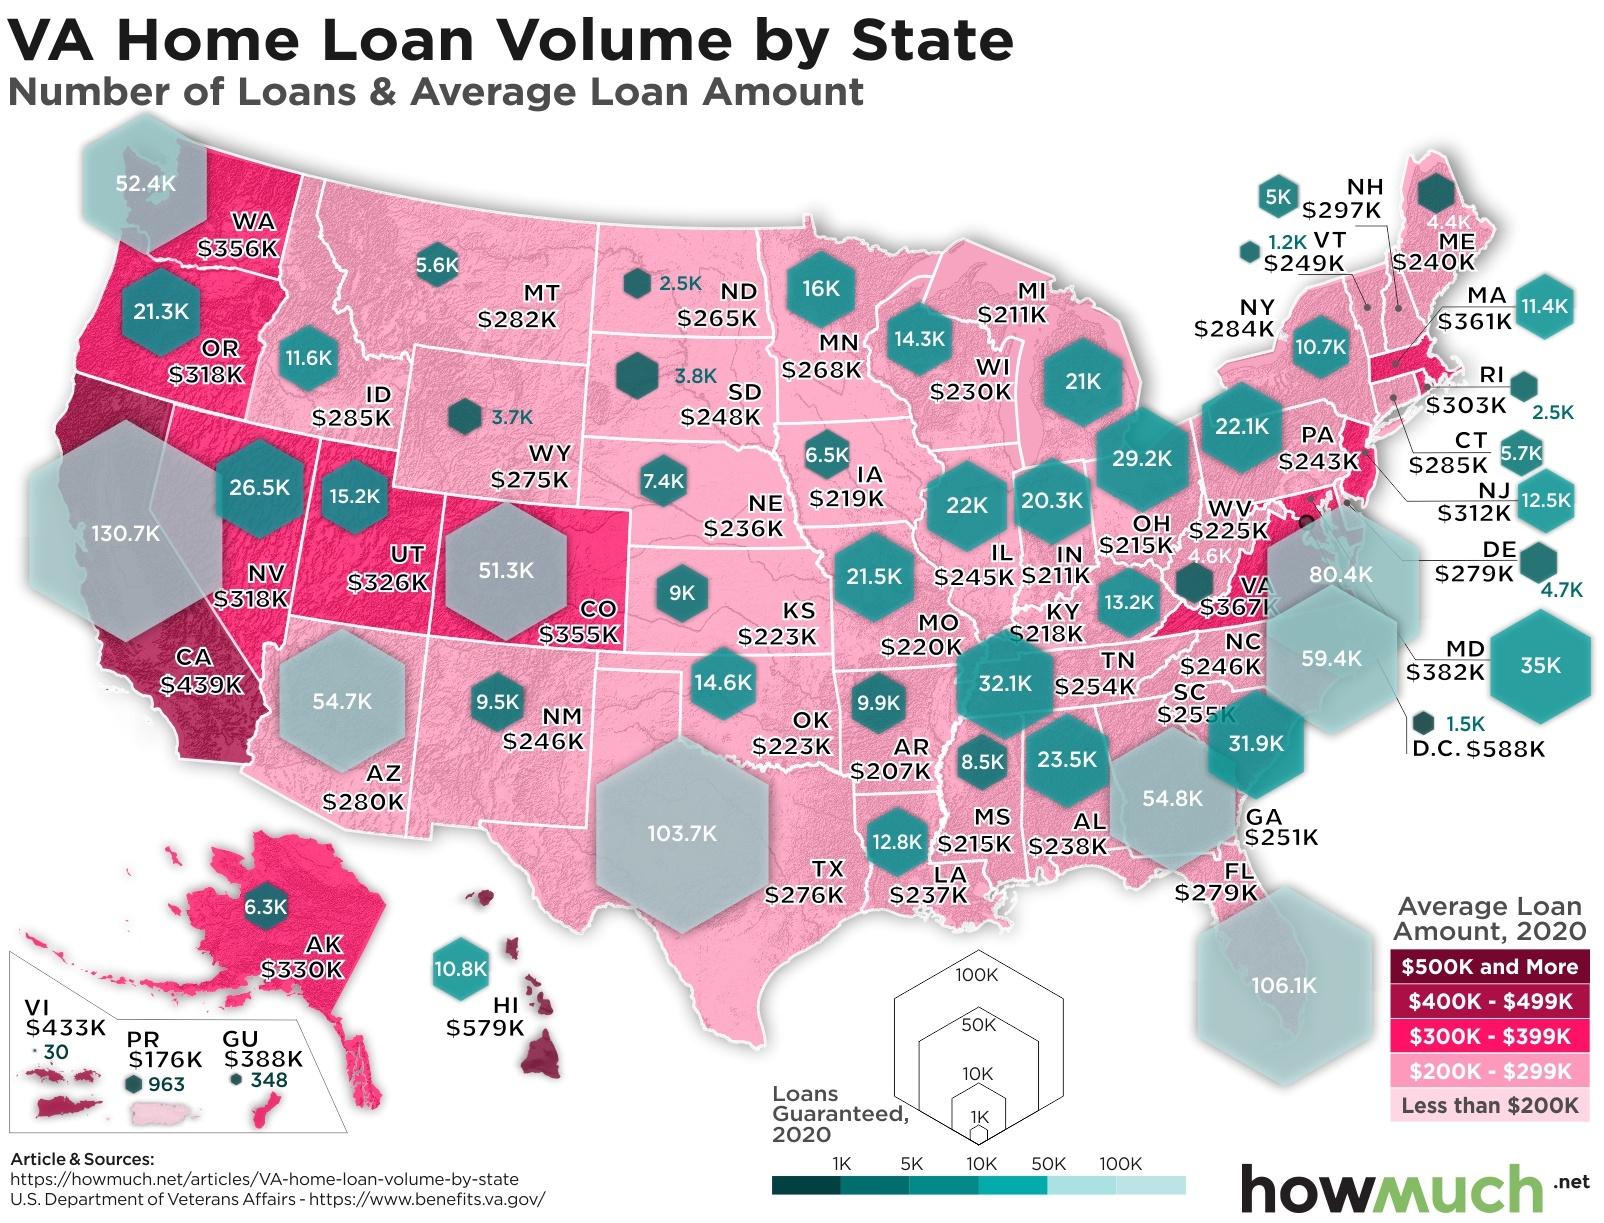 VA loan volume by state